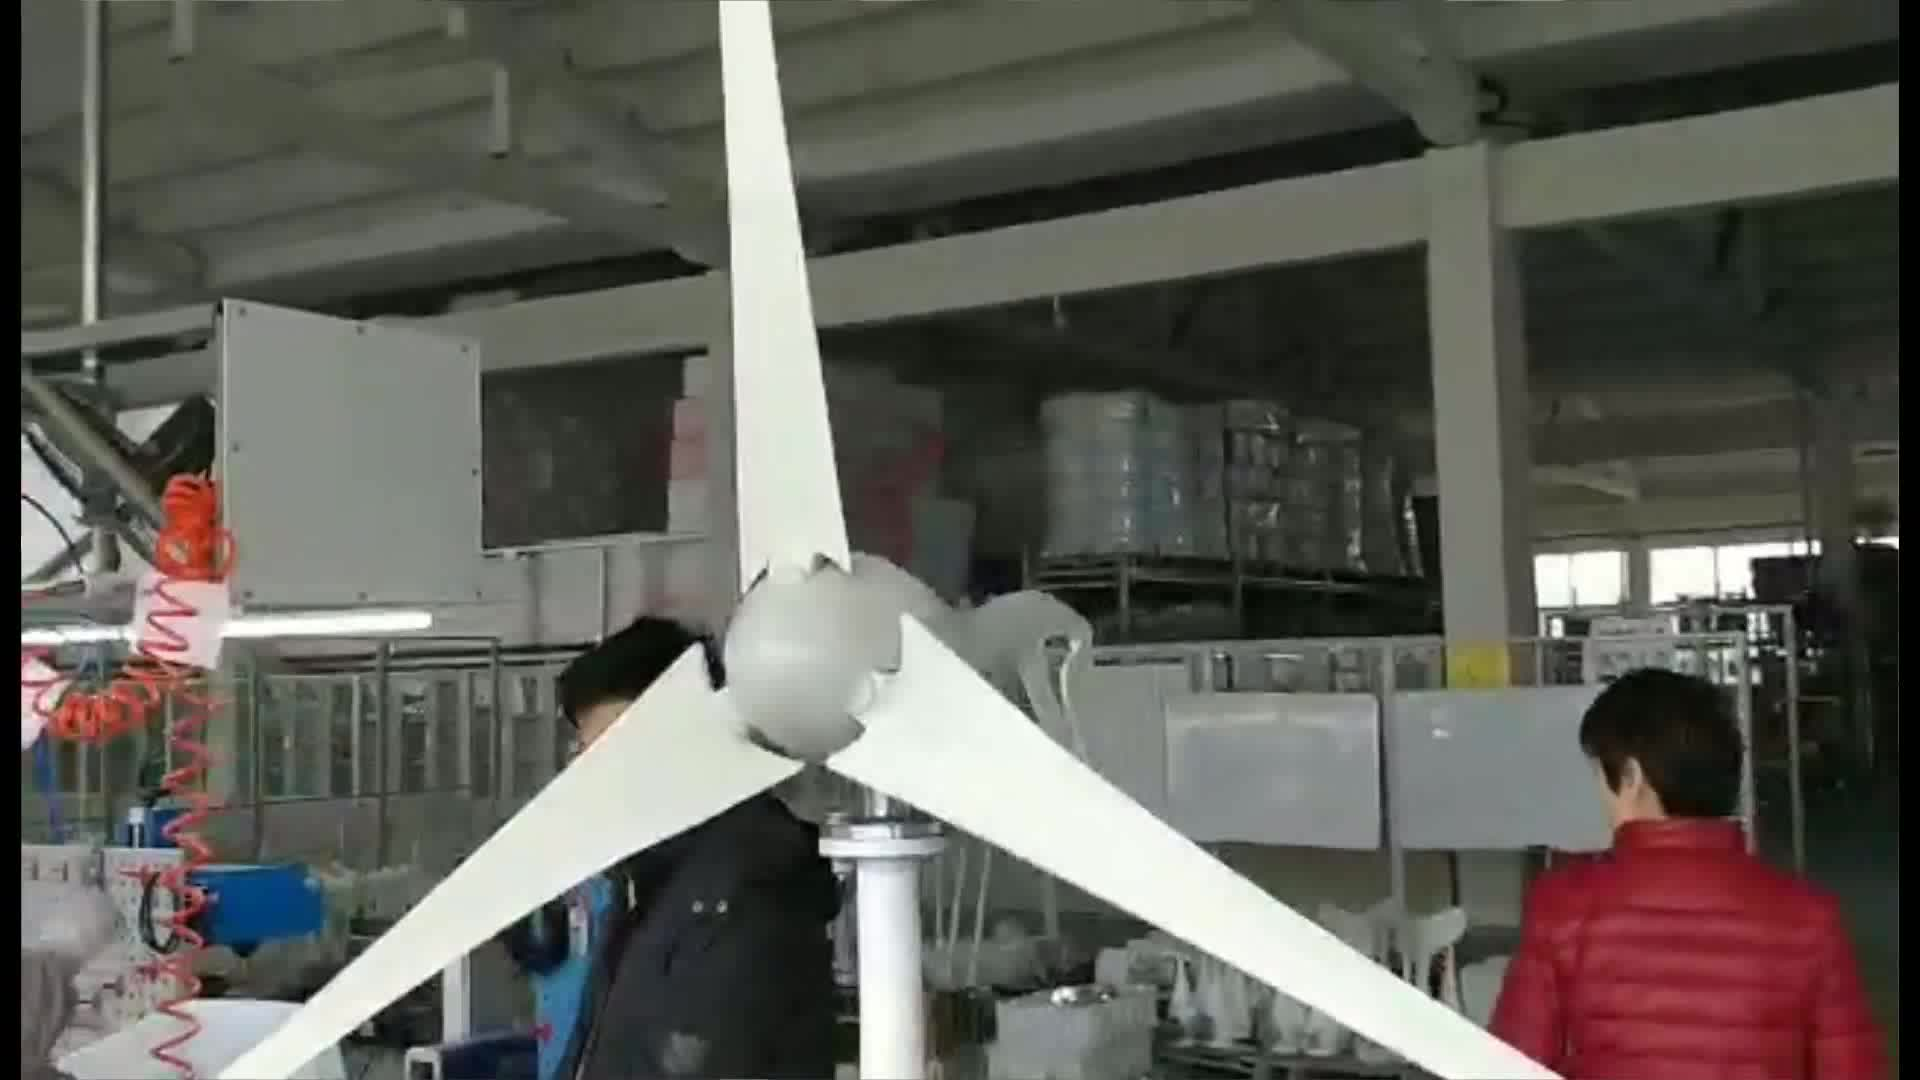 S2 series 12V 24V Nylon fiber small Wind Generator Turbine 400W 5 blades with 600W Waterproof Controller